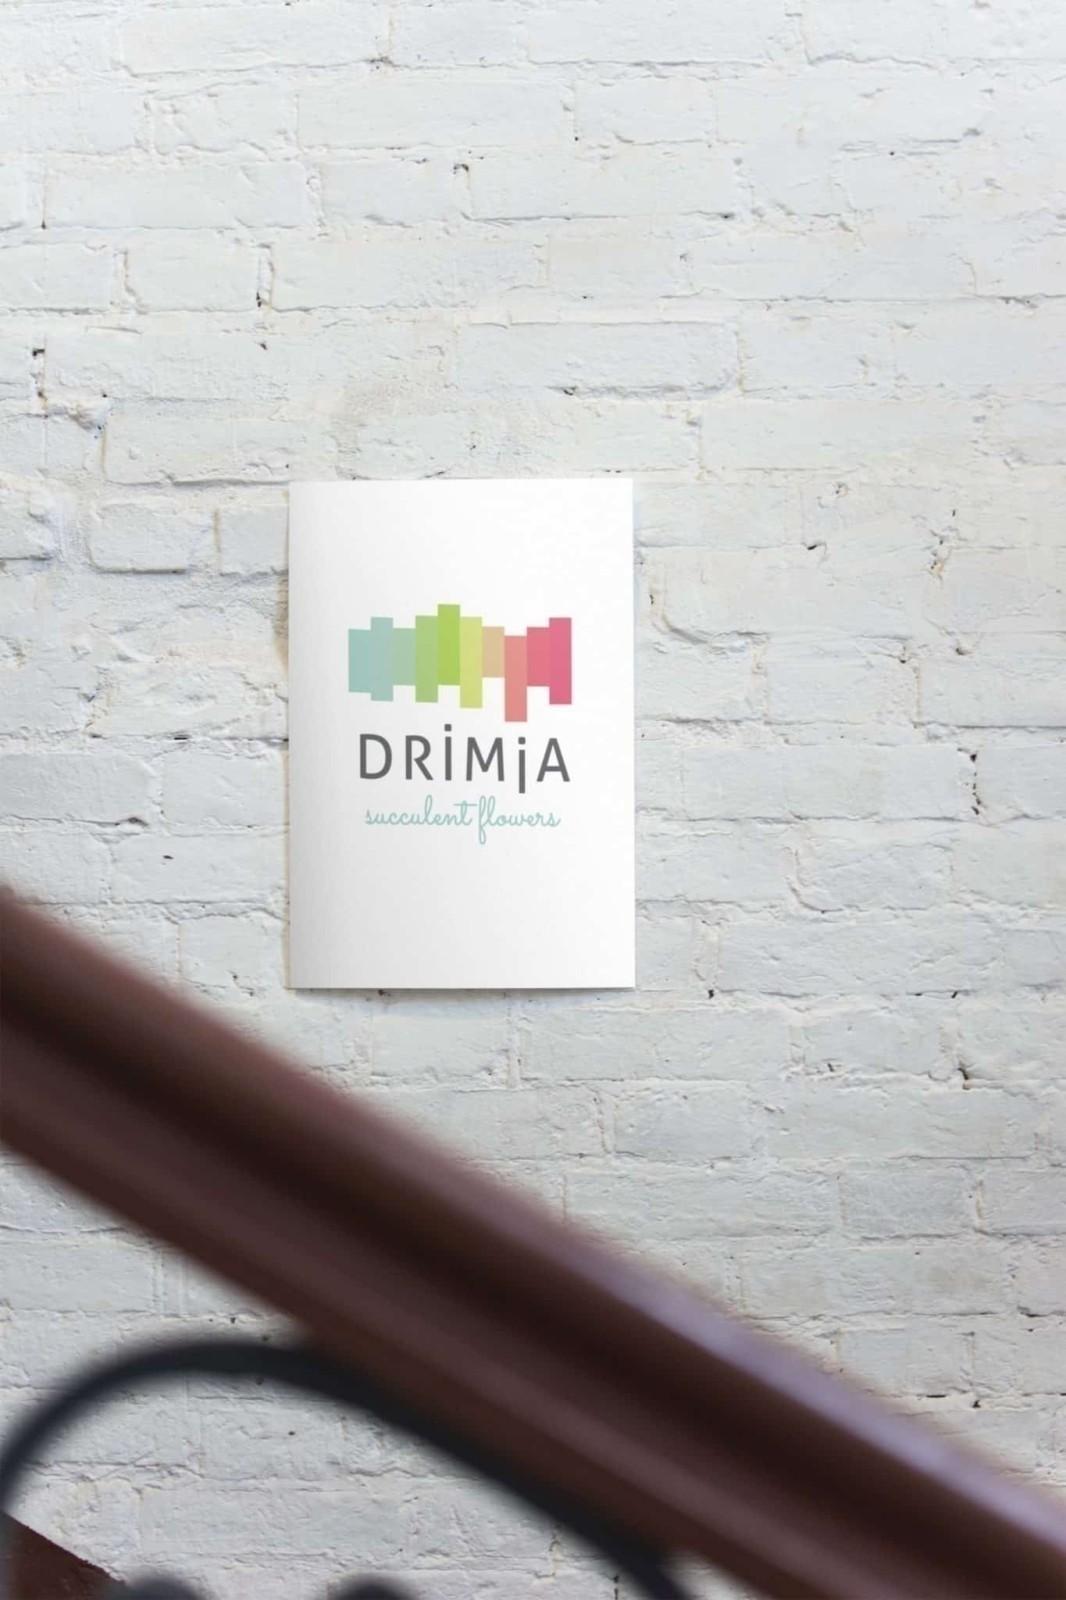 Drimia, brand identity process, suculent flowers